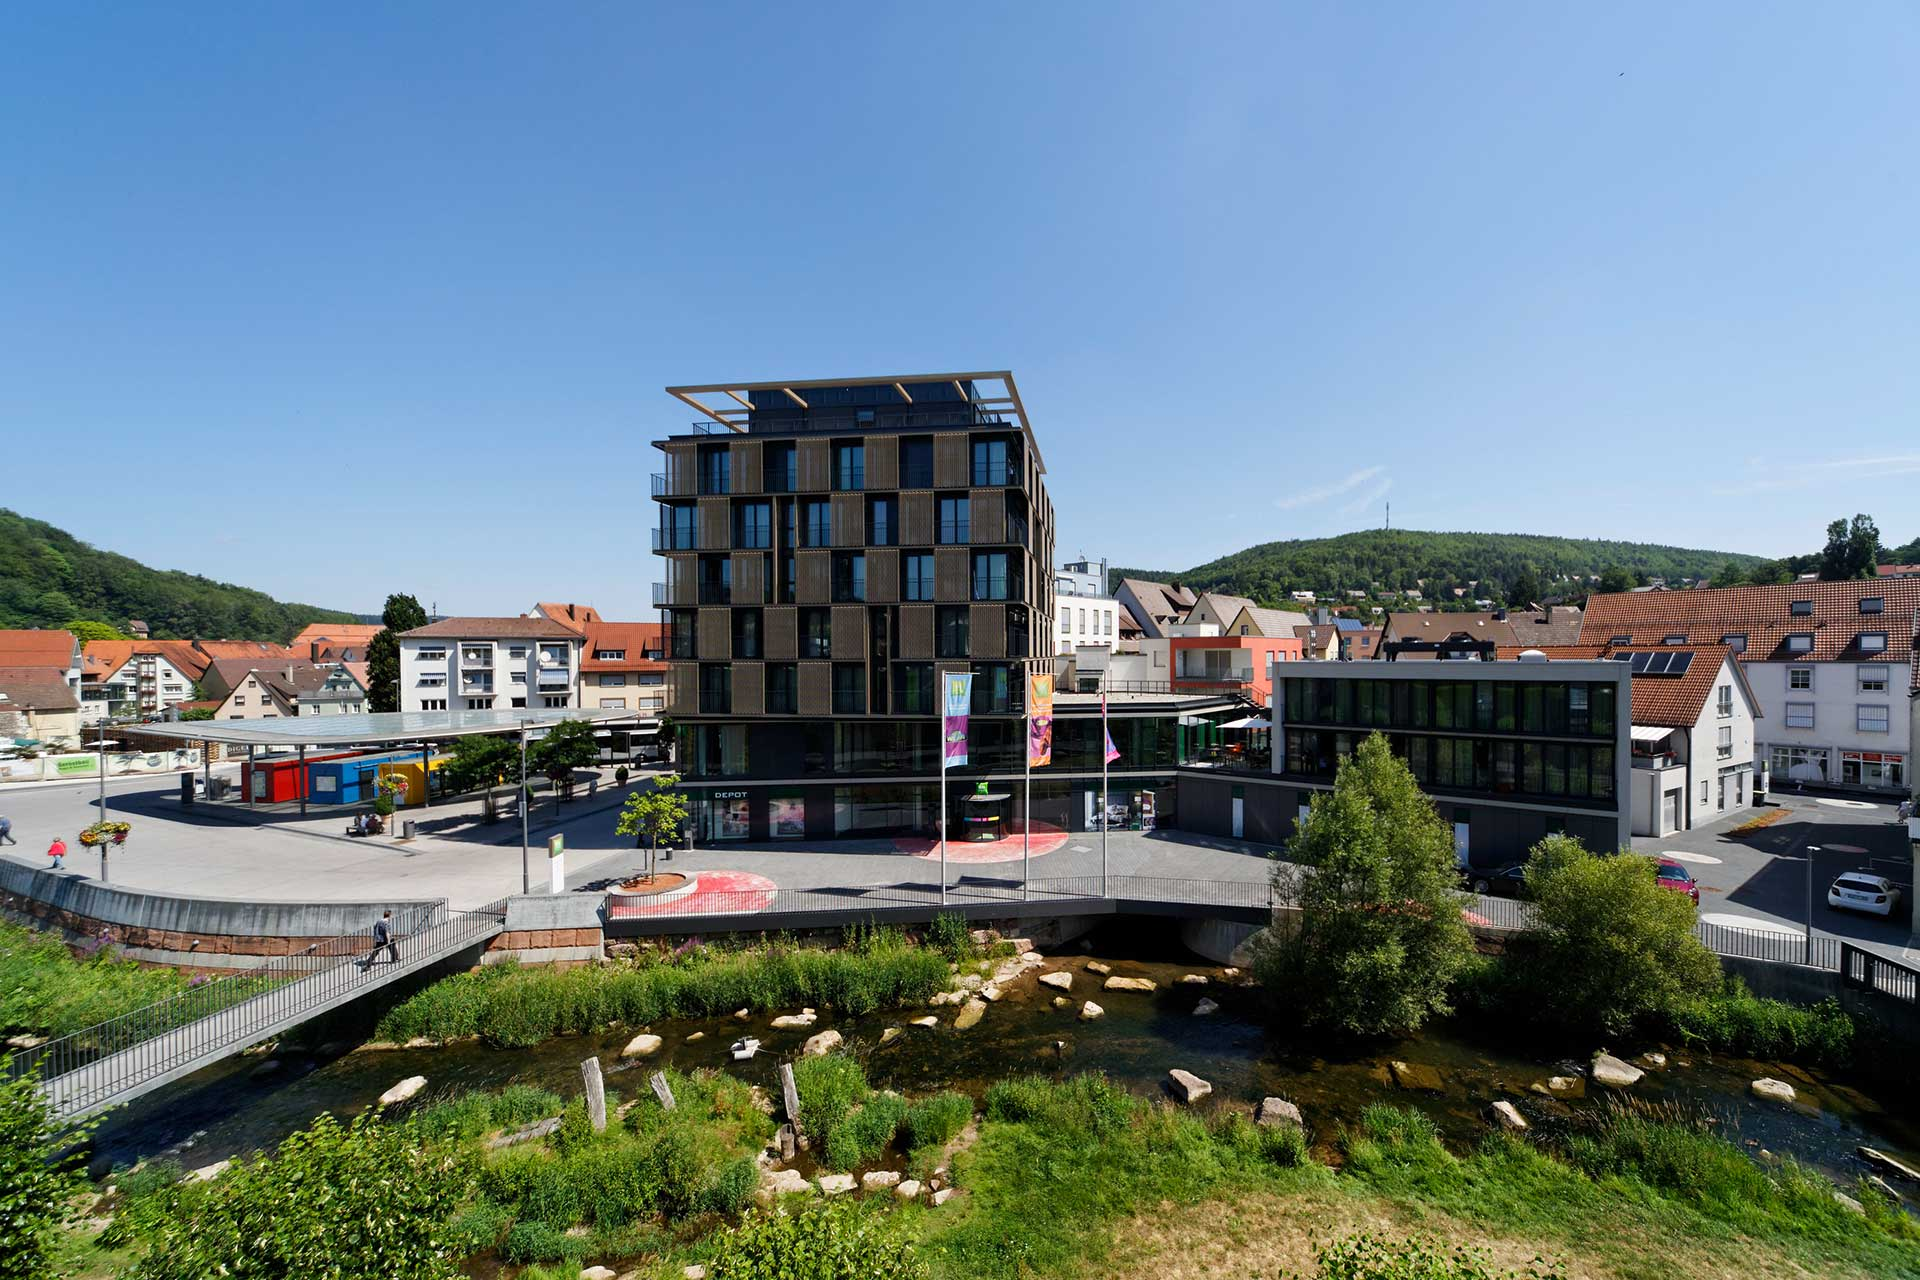 ibis Styles Nagold-Schwarzwald - Fassade